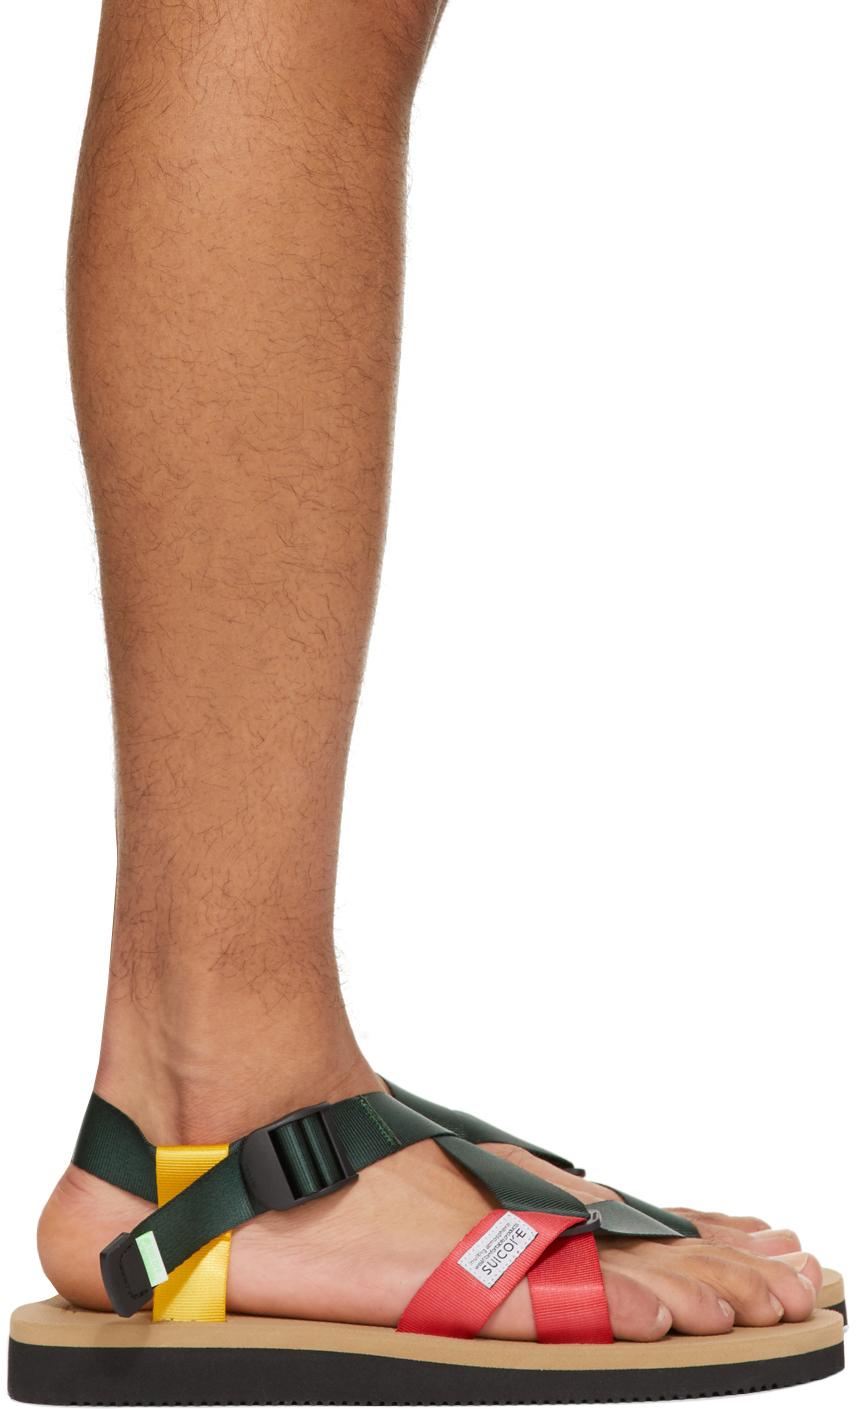 Suicoke 绿色 CHIN2-AB 凉鞋